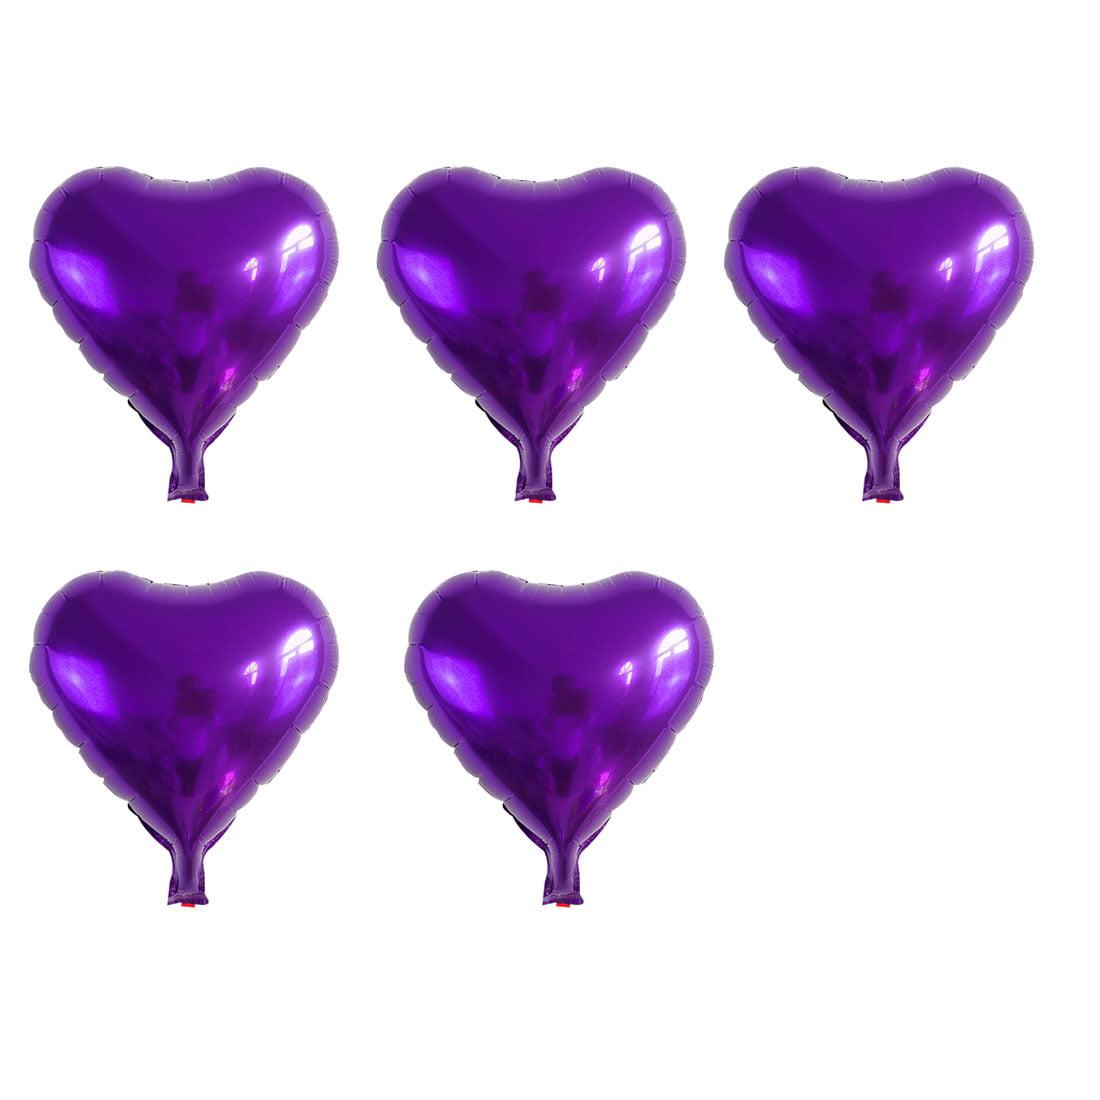 Unique Bargains Foil Heart Shape Balloon Birthday Wedding Decor Purple 5 Inches 5 Pcs